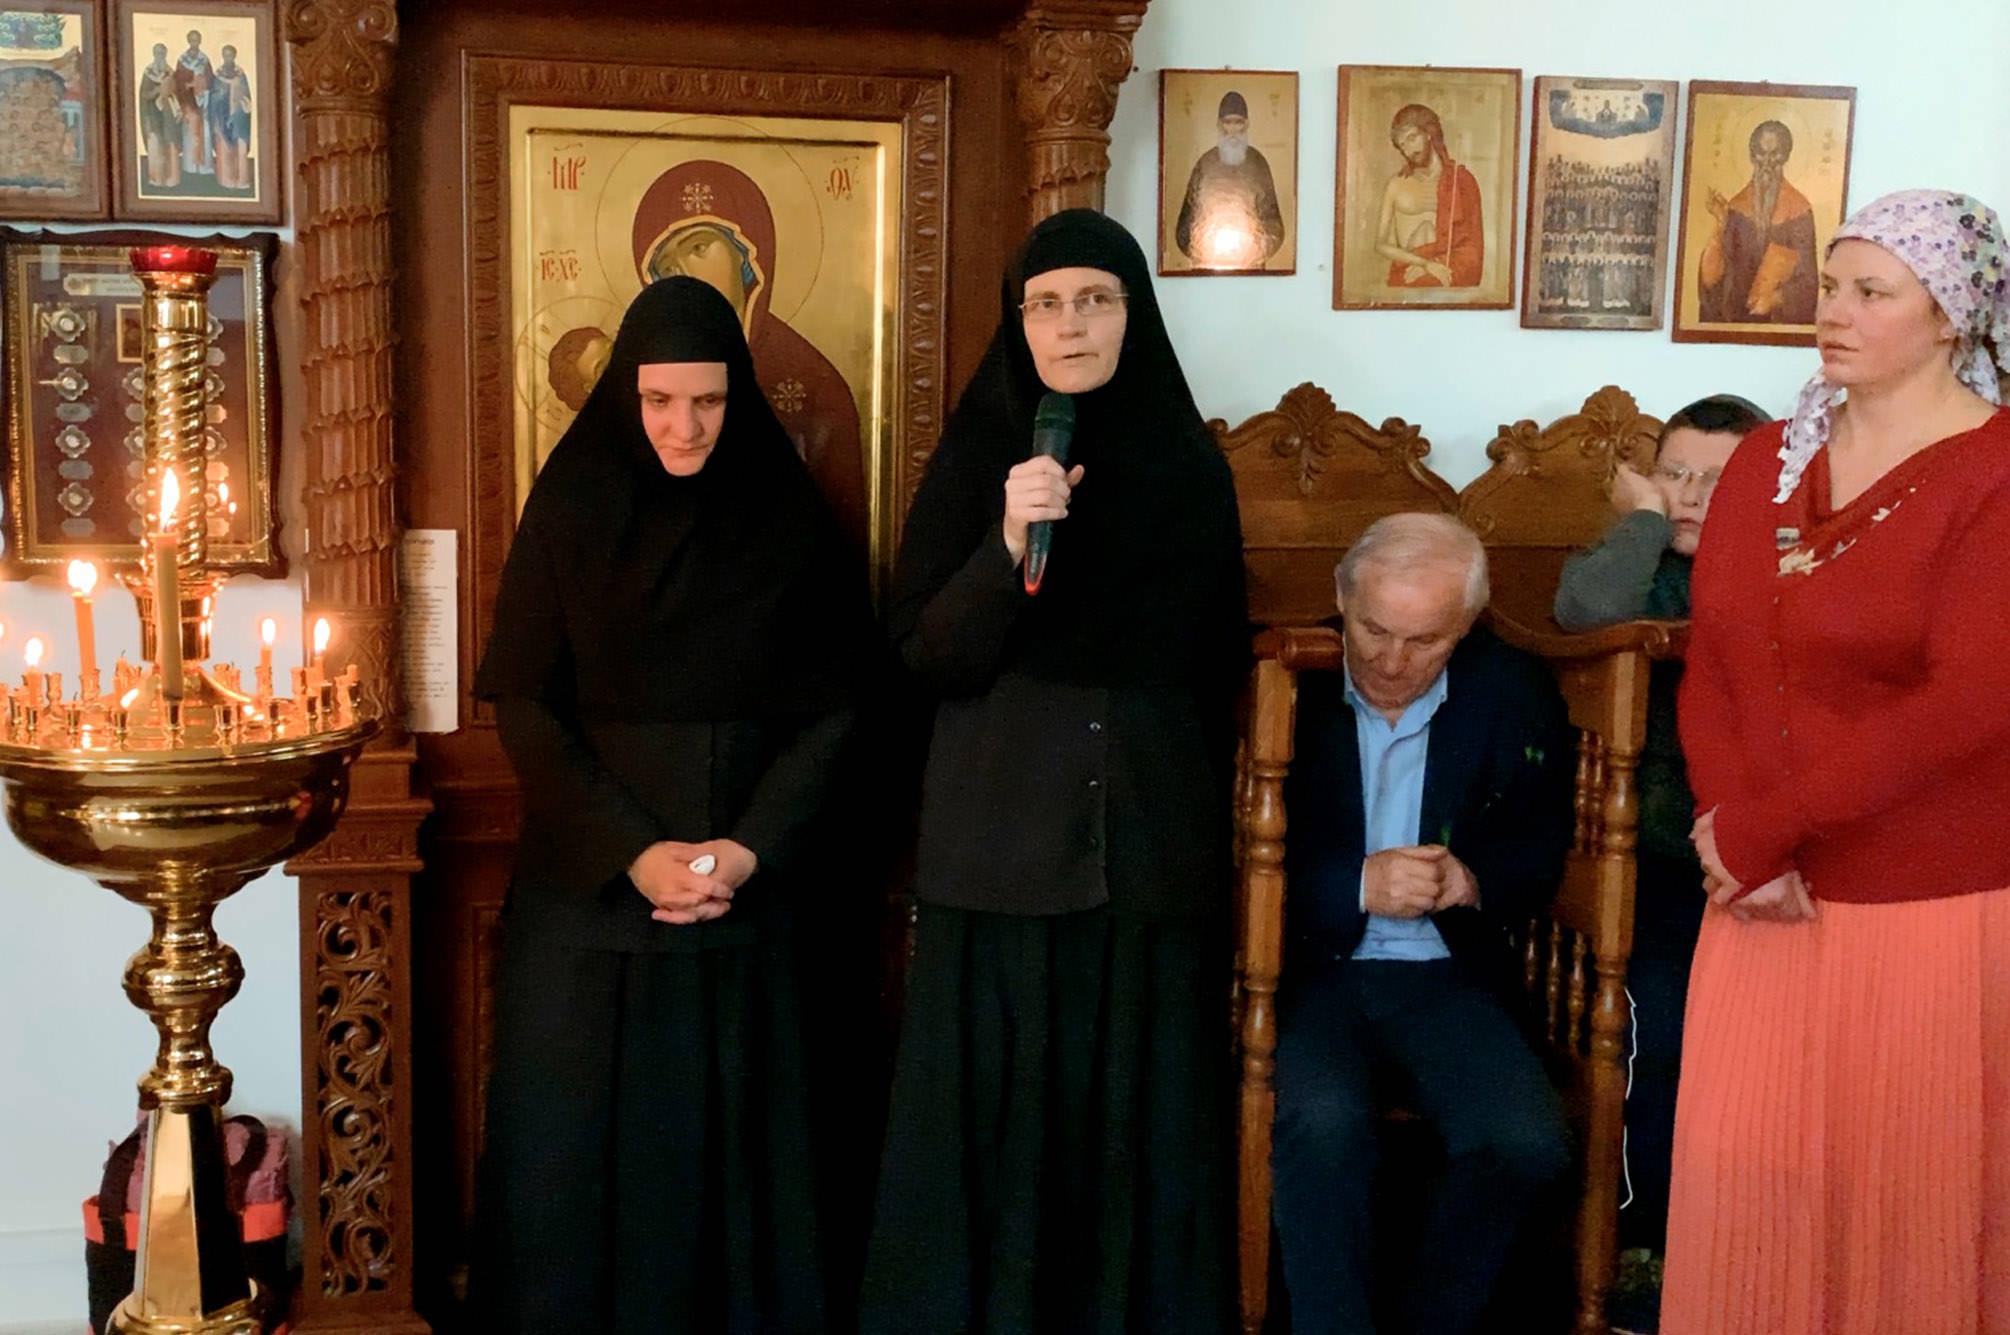 Monasterska praktyka ikonograficzna